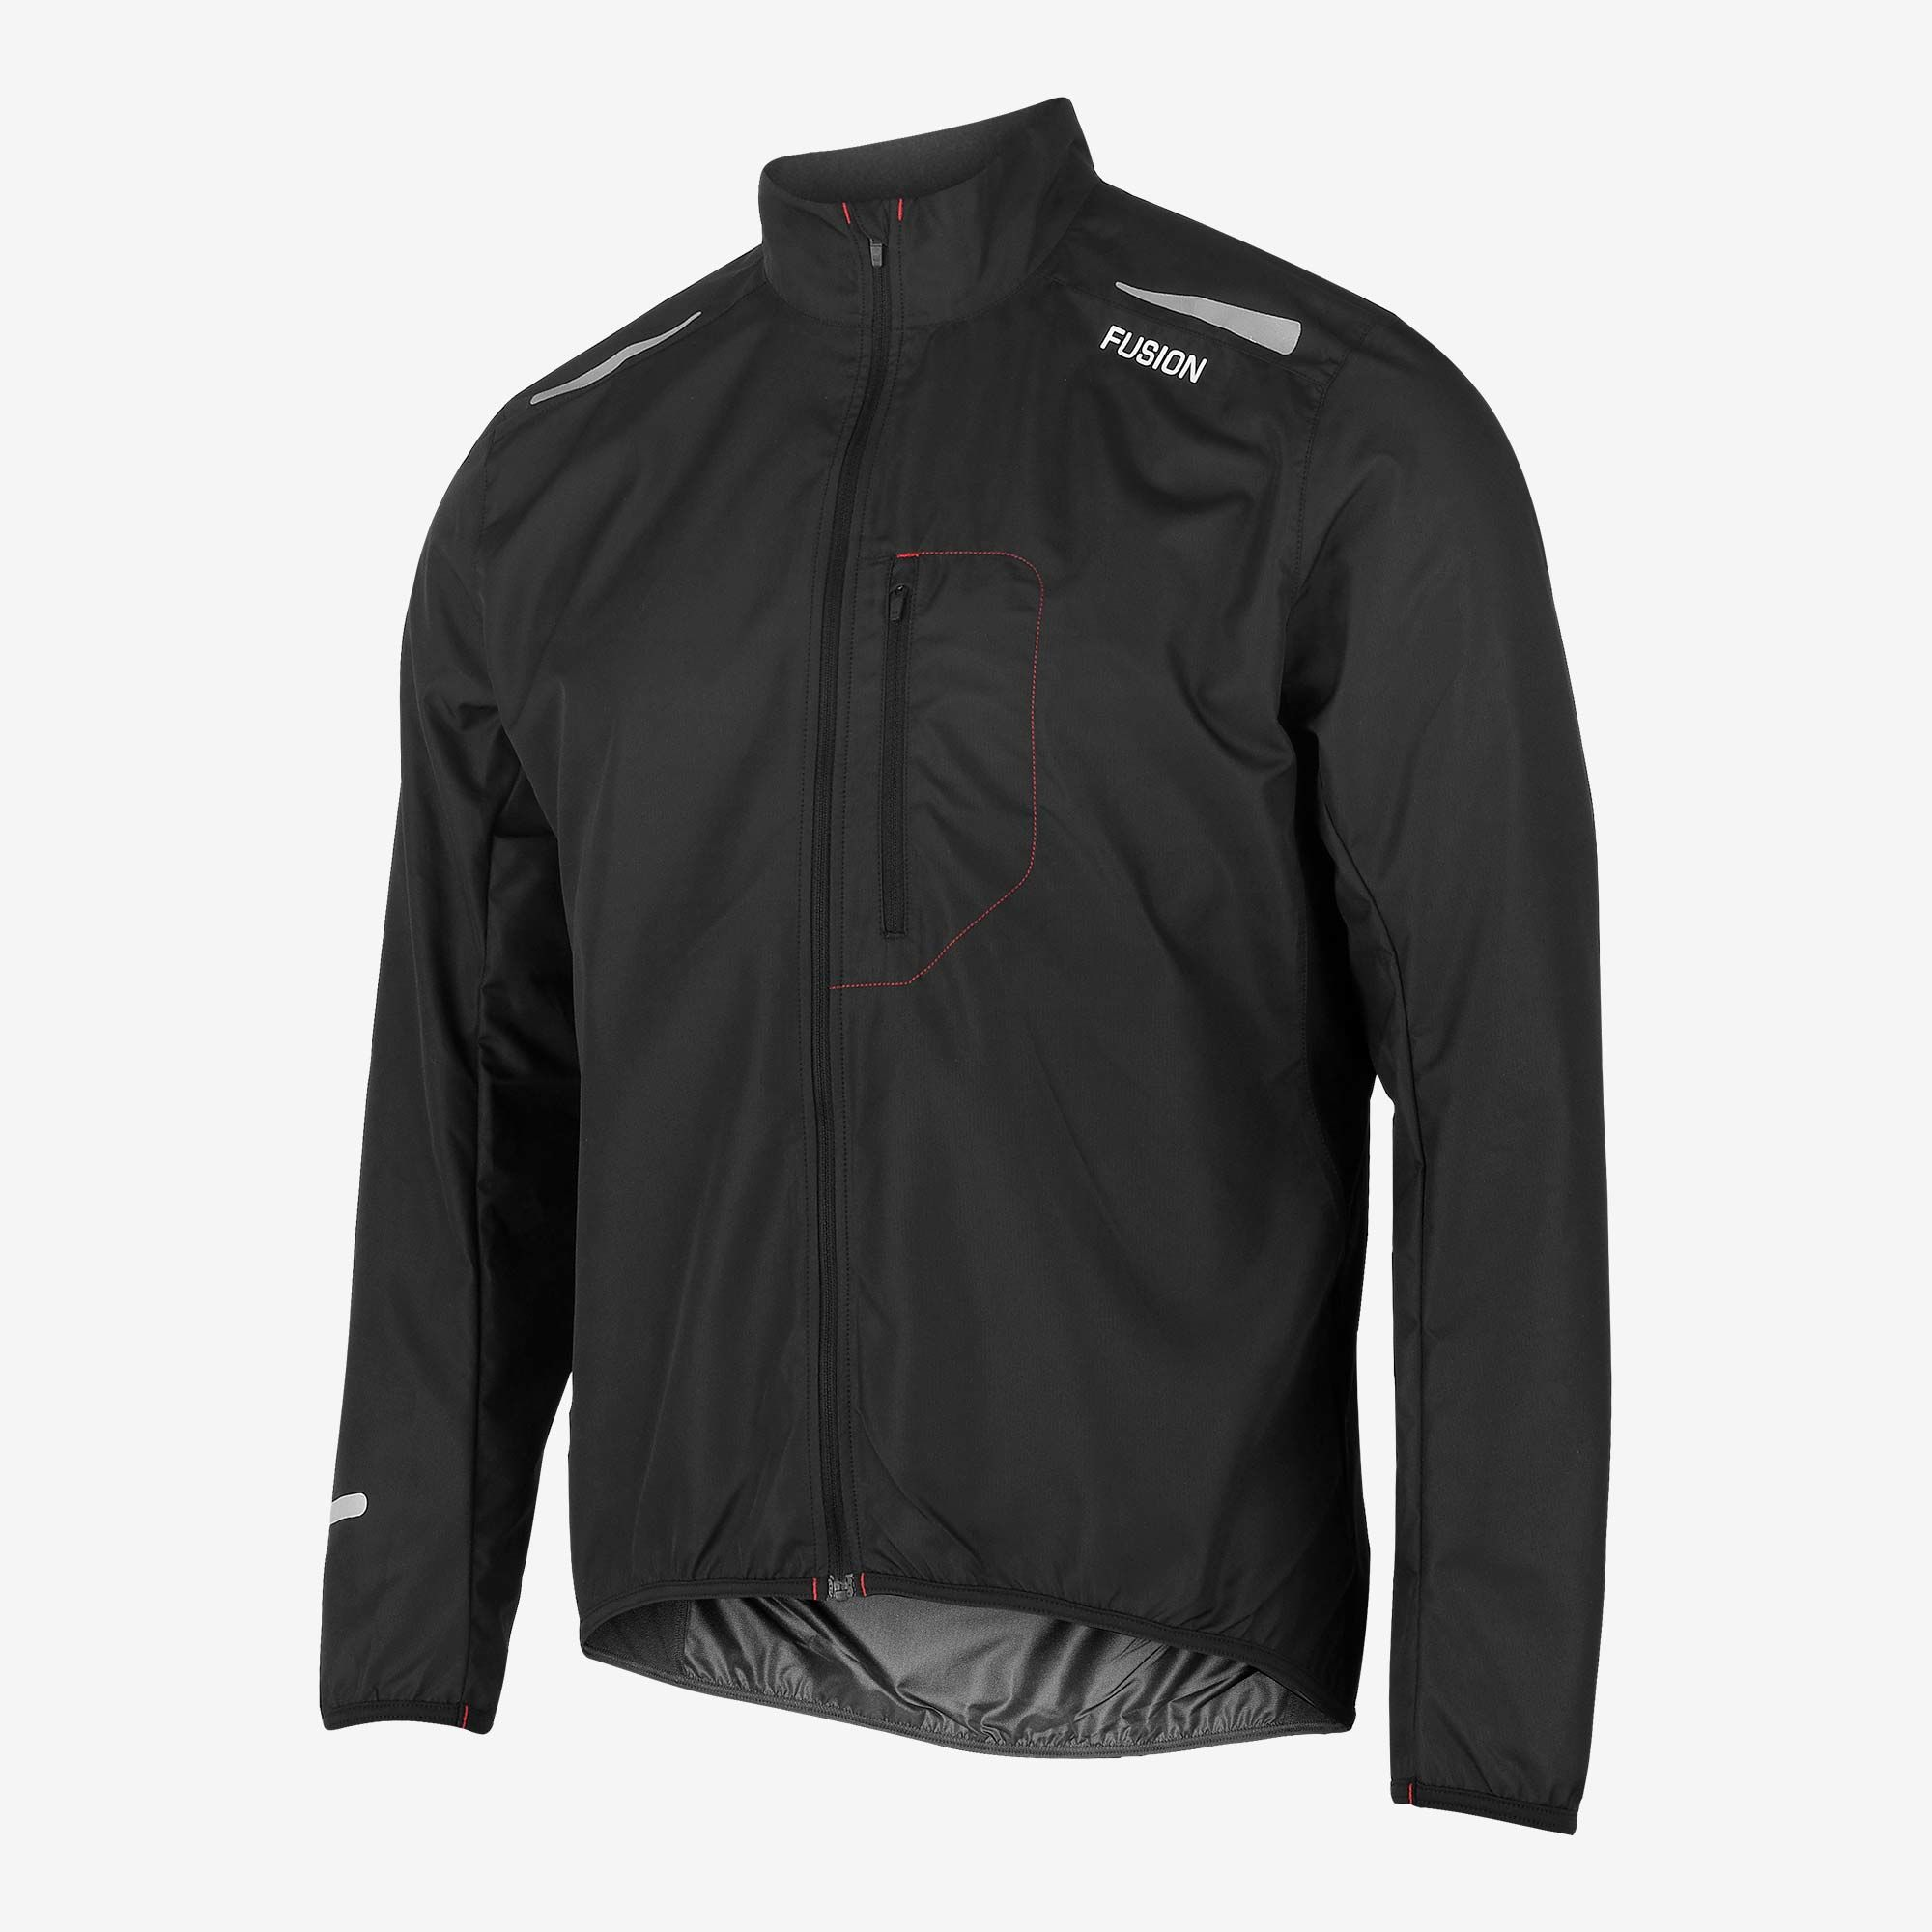 Fusion S1 Run Jacket (Black)